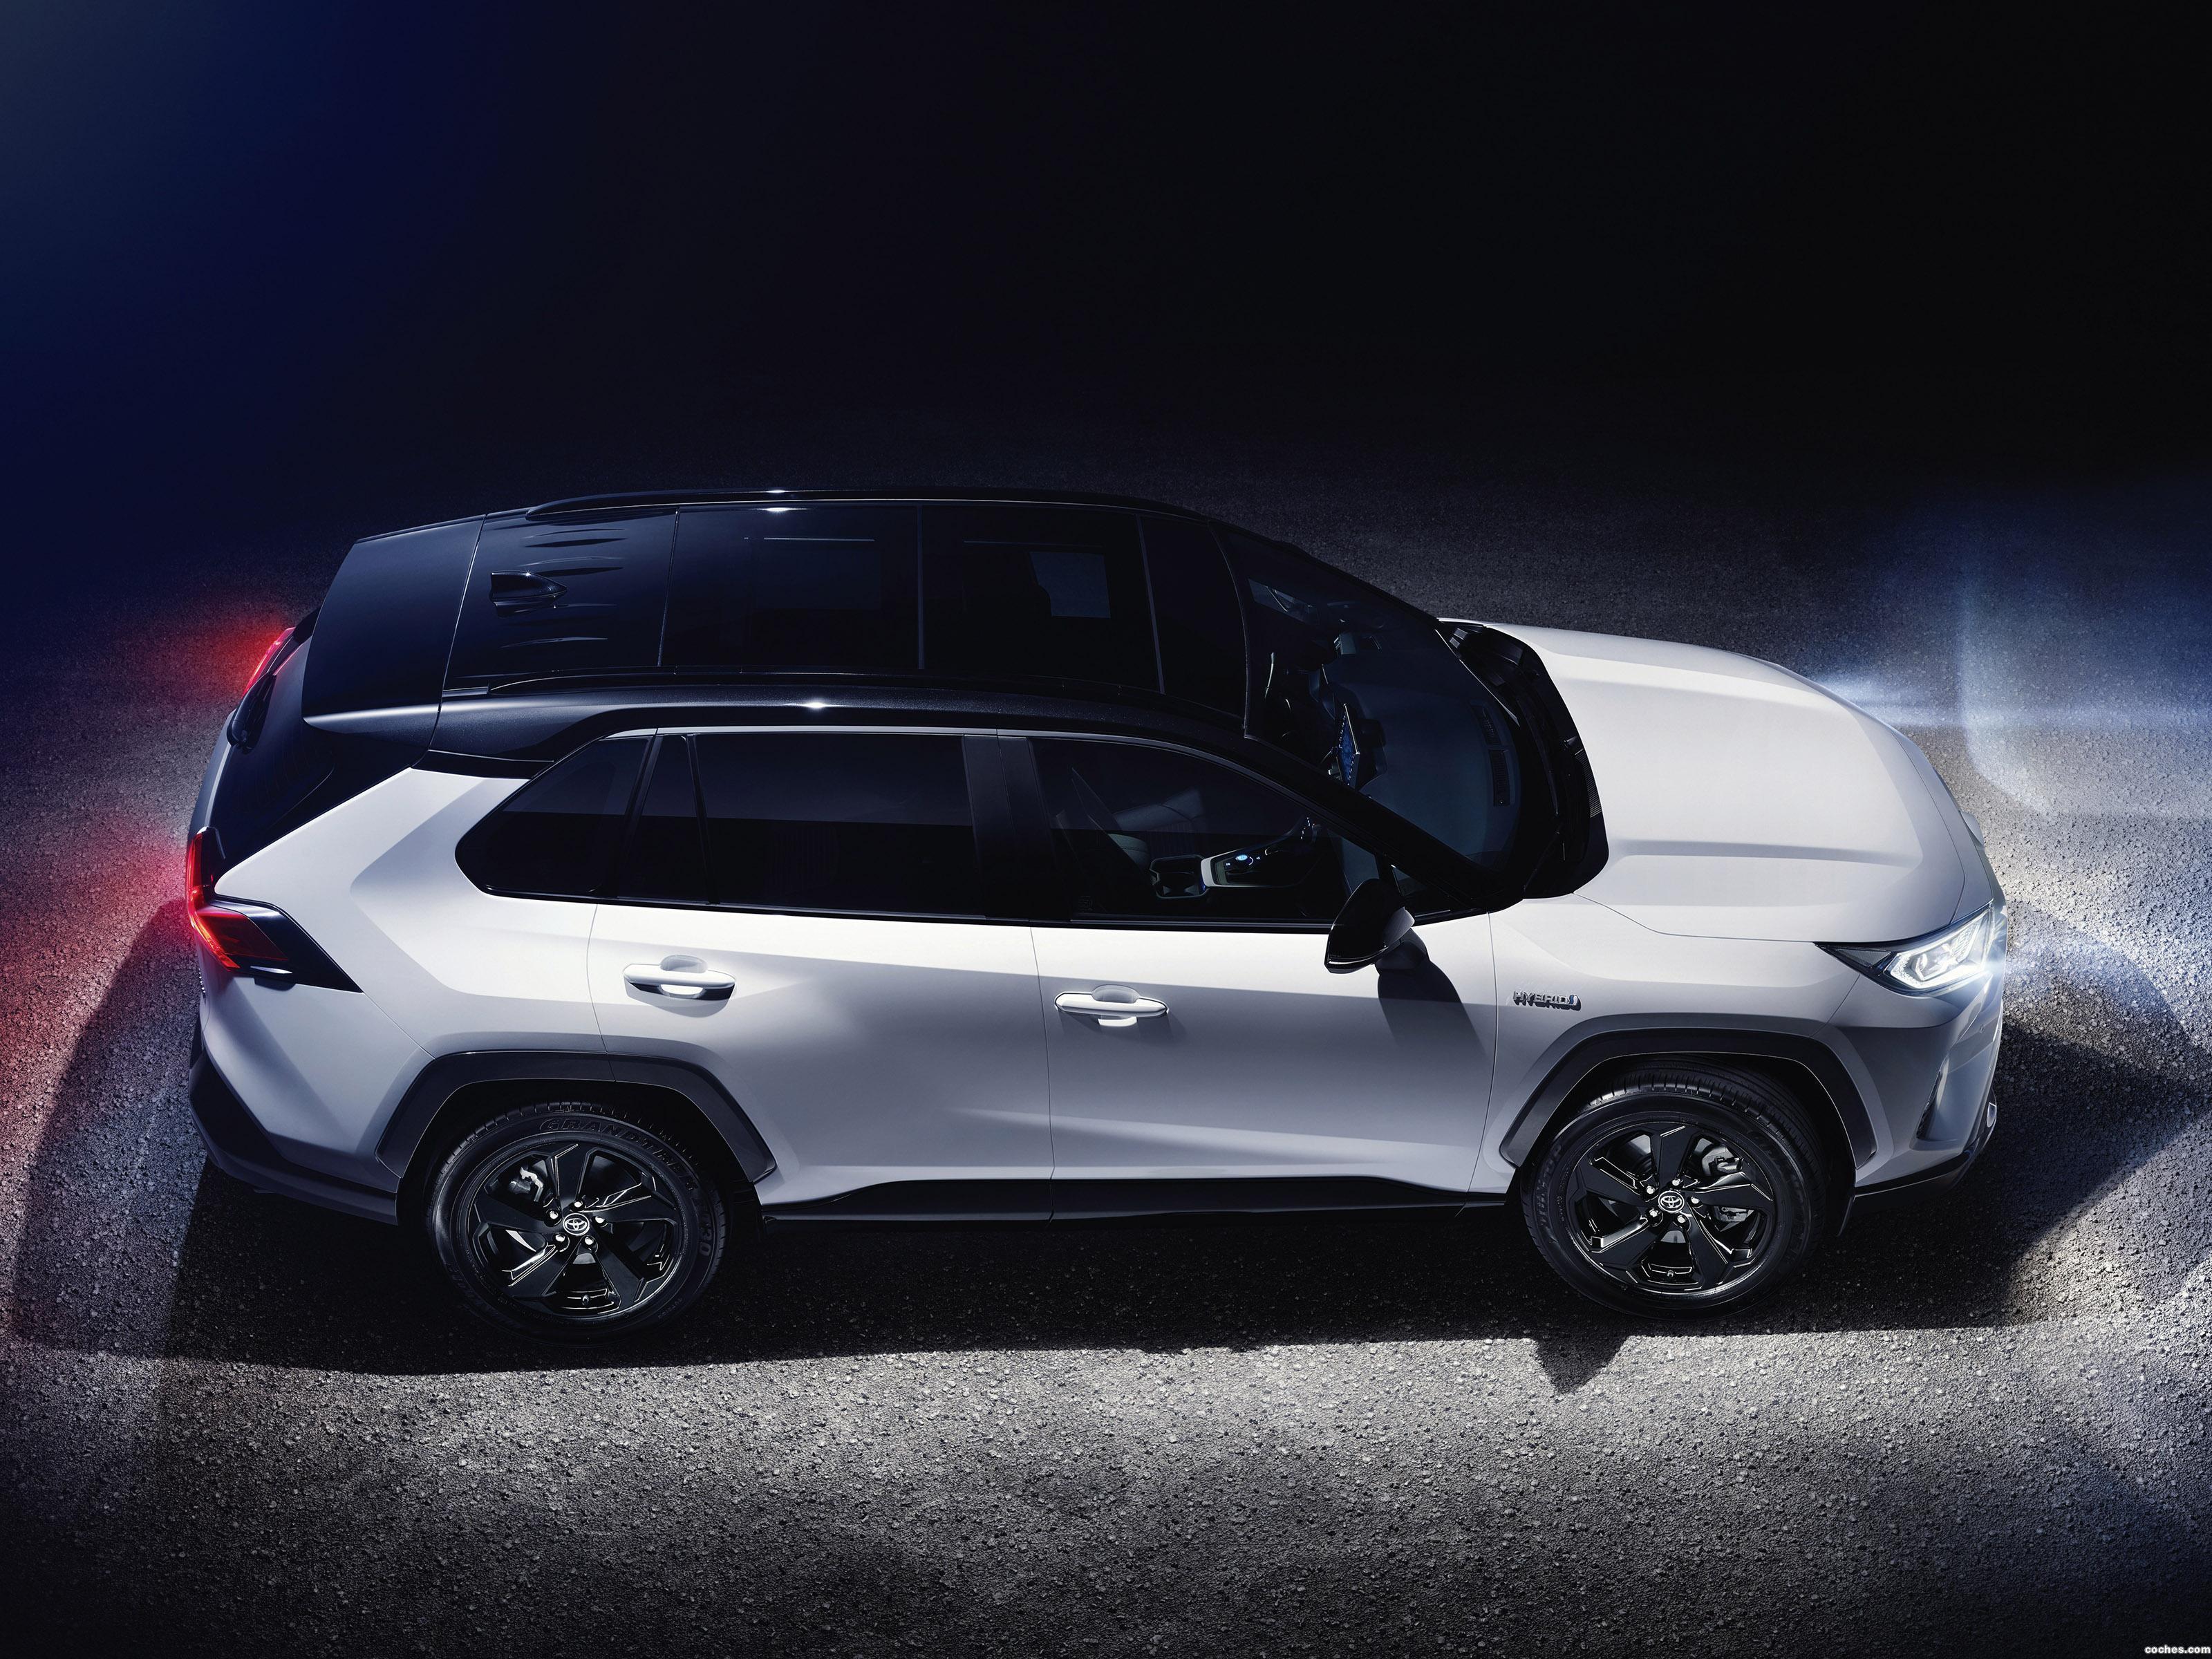 Foto 1 de Toyota RAV4 Hybrid 2019